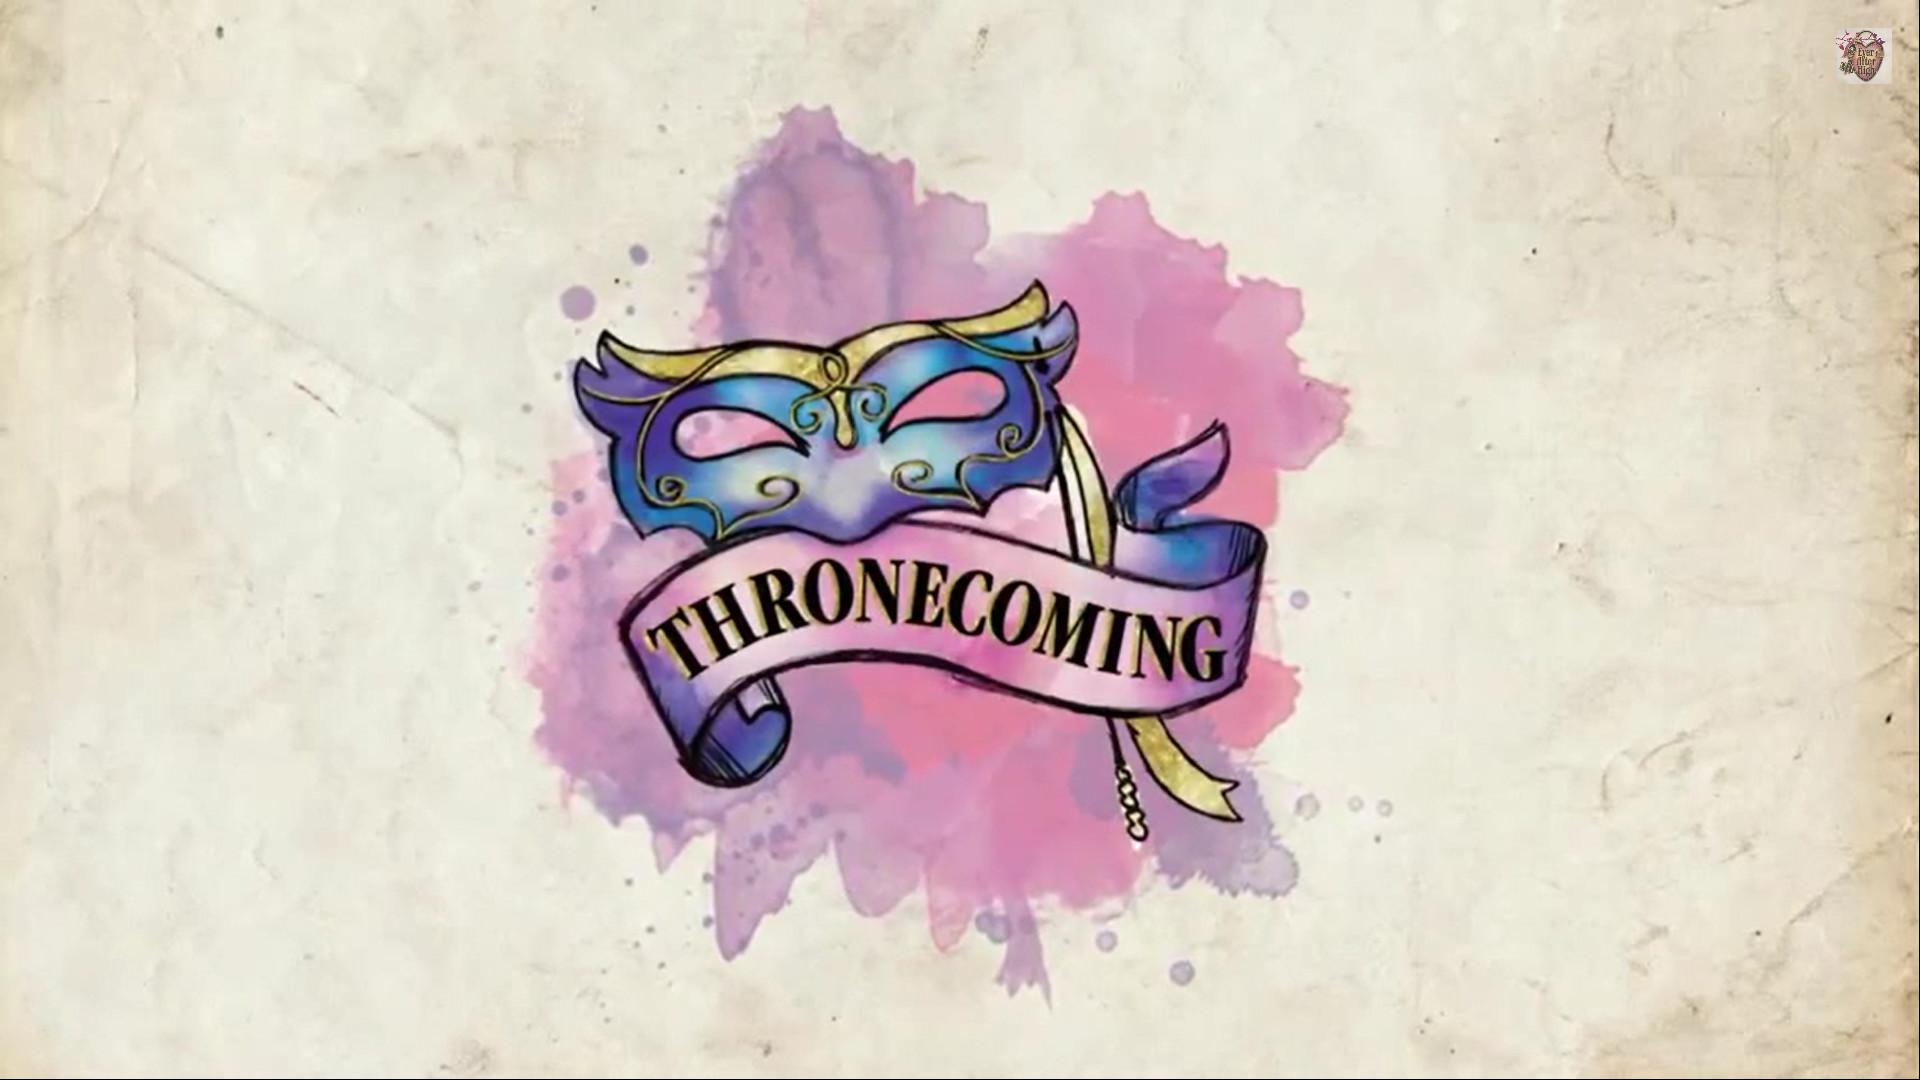 Thronecoming logo.png